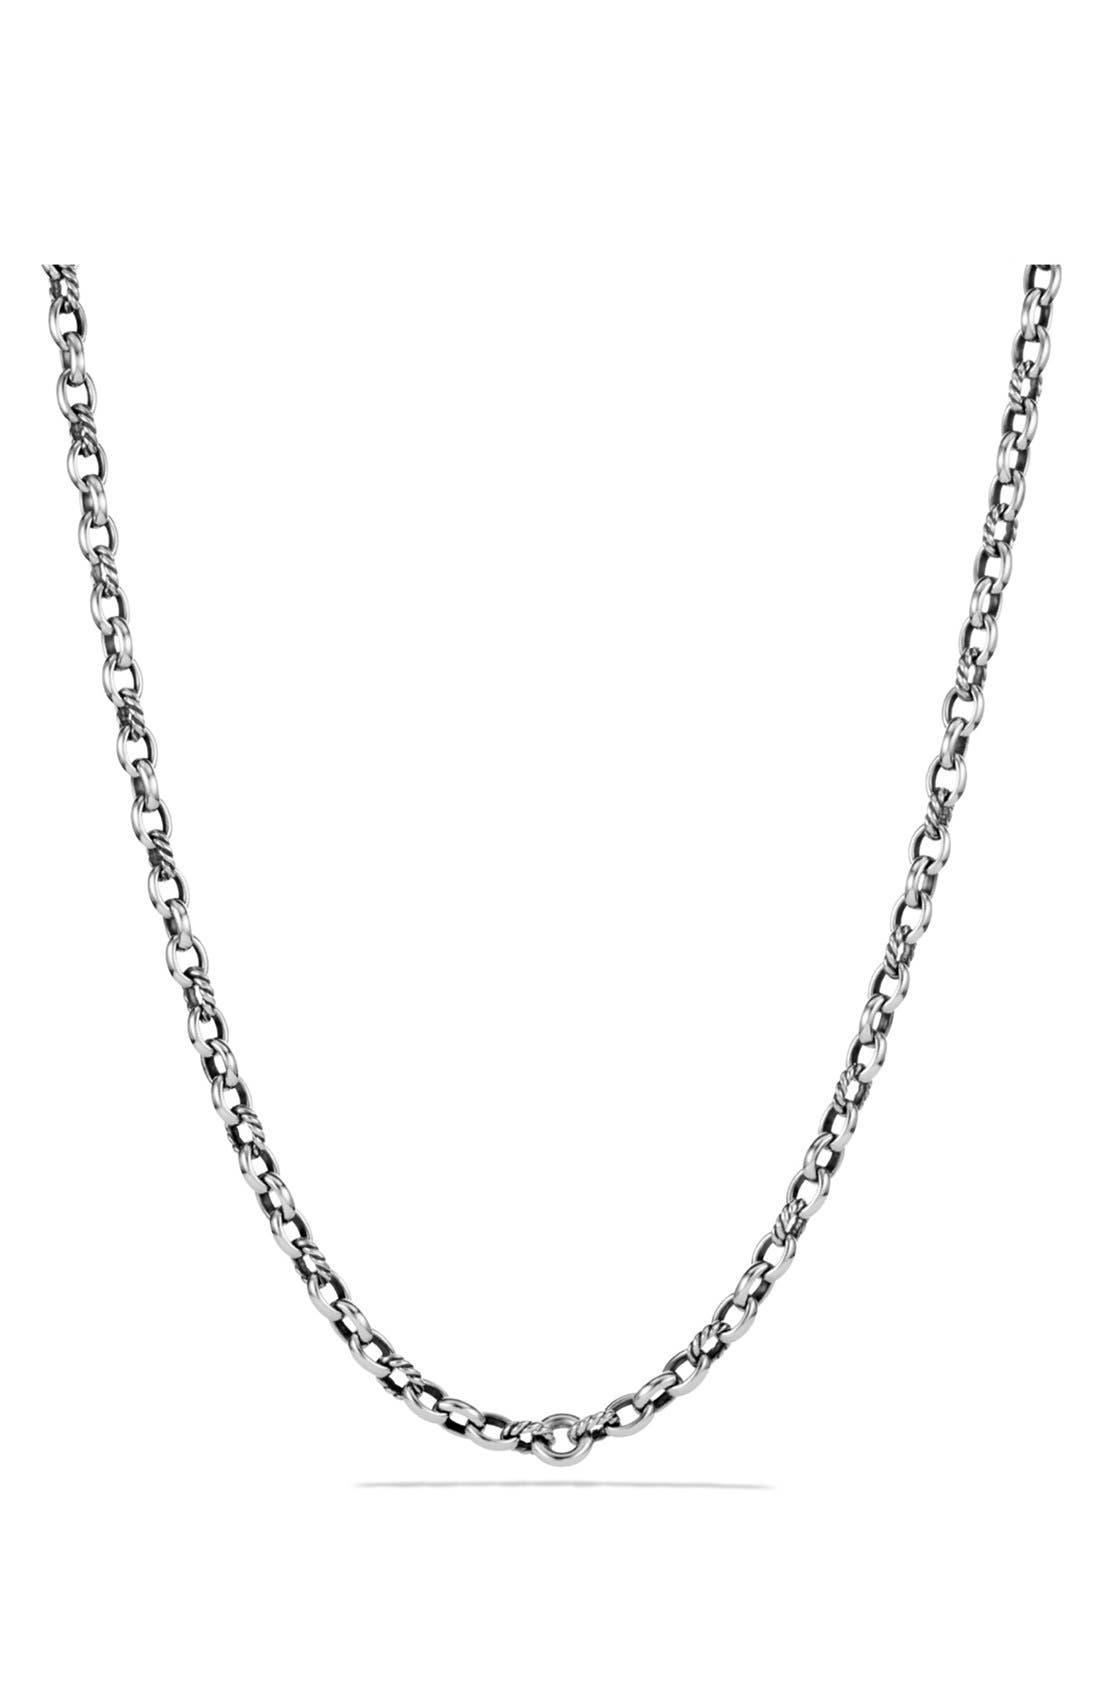 Alternate Image 1 Selected - David Yurman 'Chain' Cushion Chain Necklace